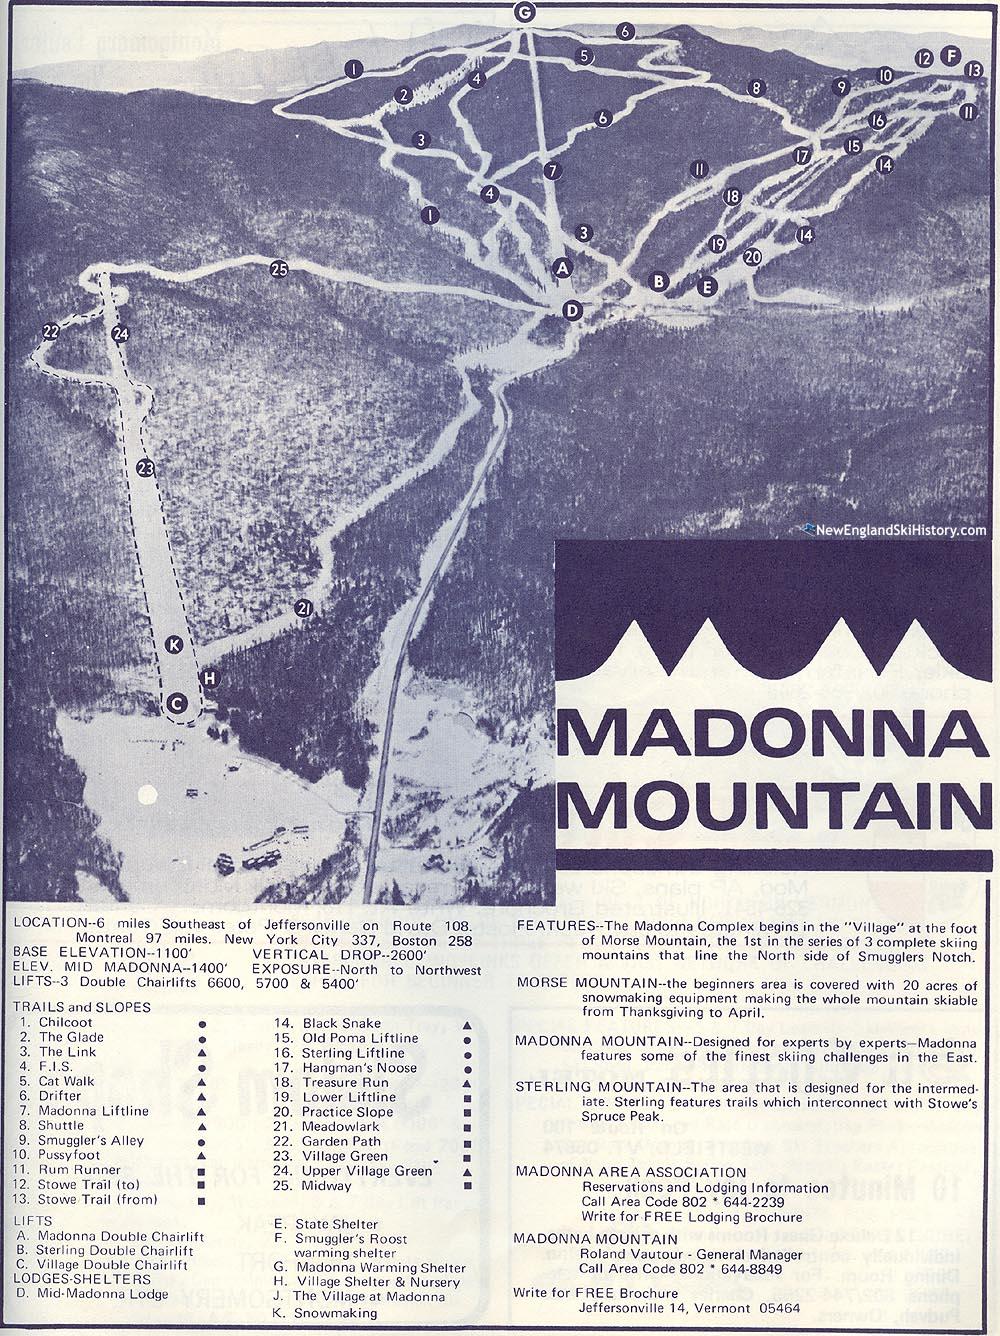 1968-69 Smugglers Notch Trail Map - New England Ski Map ... on pico peak ski map, pagosa springs co ski map, vermont ski map, lea sd ski map, smugglers map mountain, sugarbush ski map, smuggler s notch map, jay peak ski map, park city ski map, weston ski map, vermont smugglers' notch map,